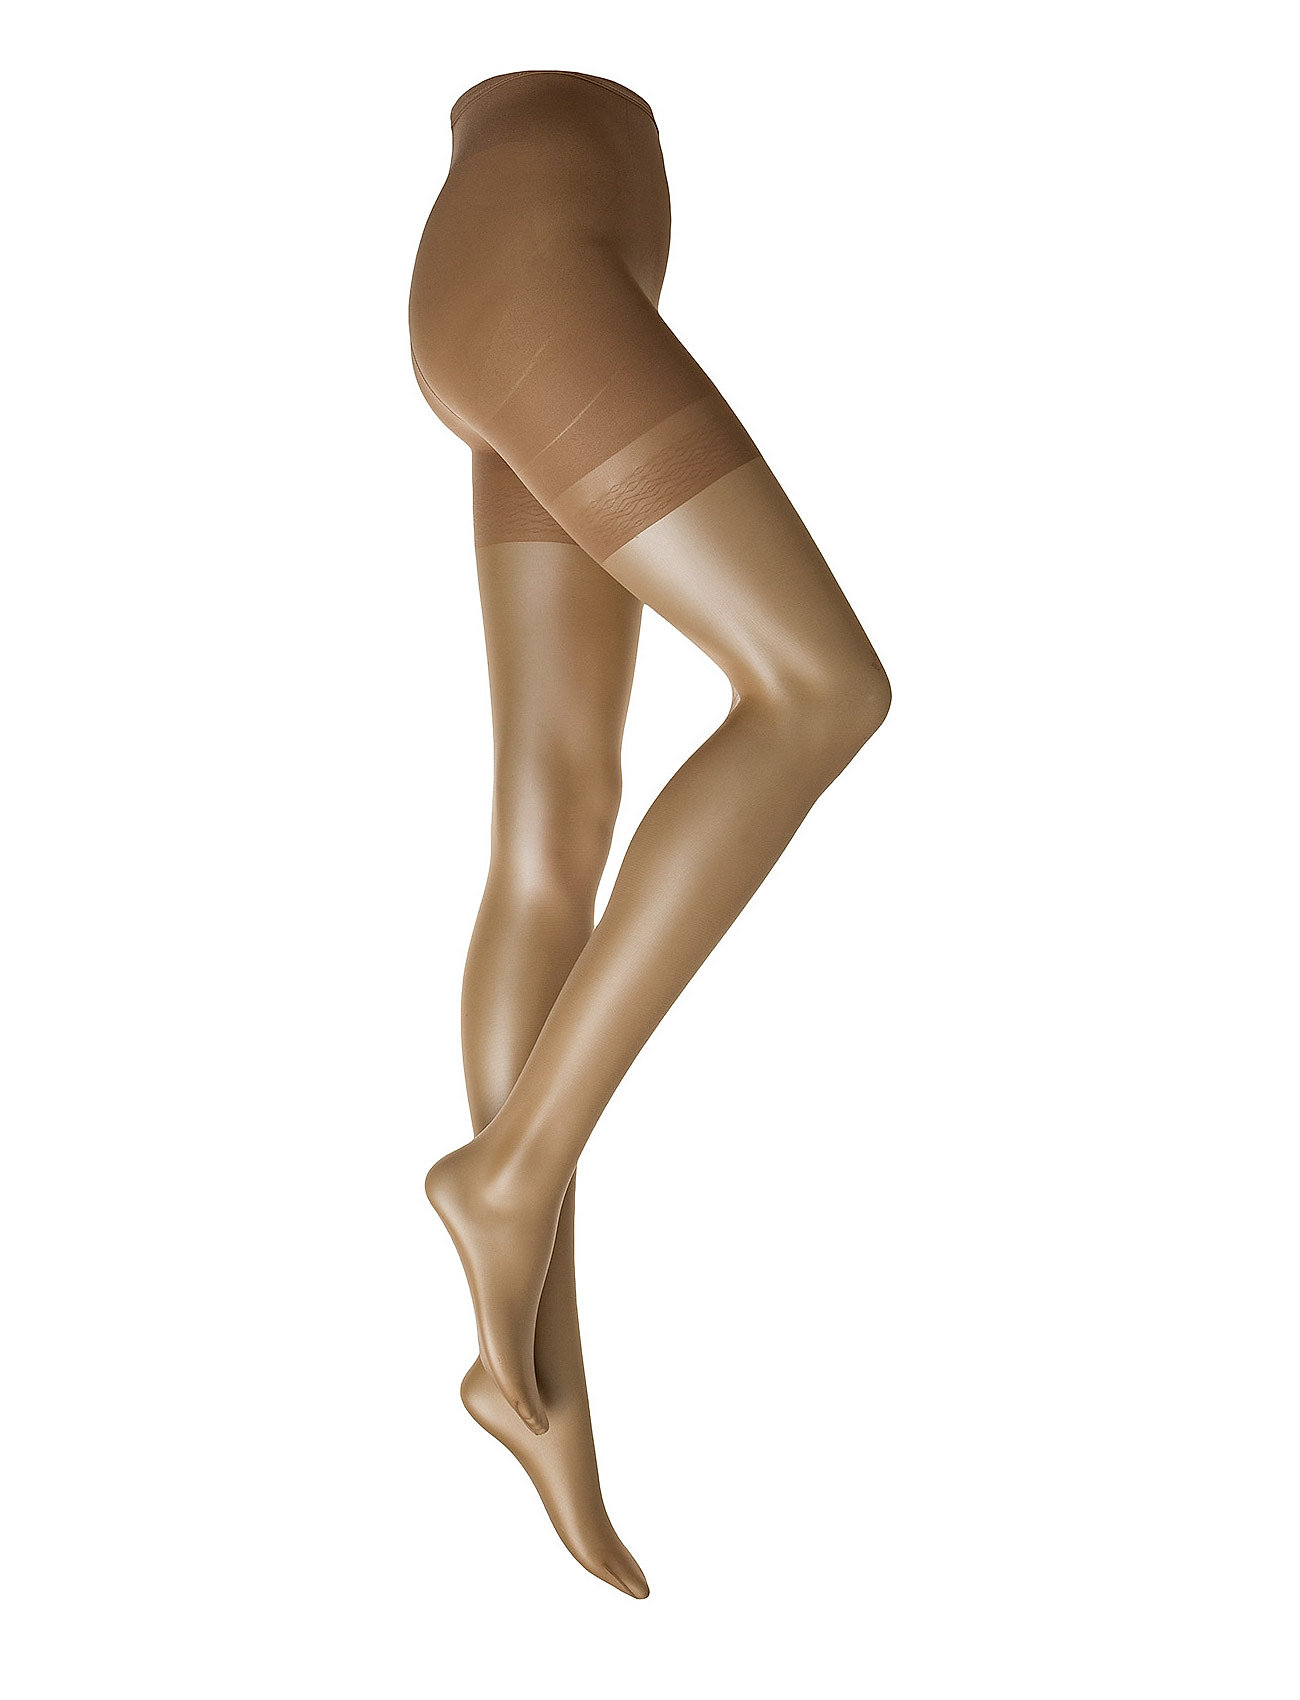 Vogue Ladies den pantyhose, Silhouette Control Top 20den - SUNTAN